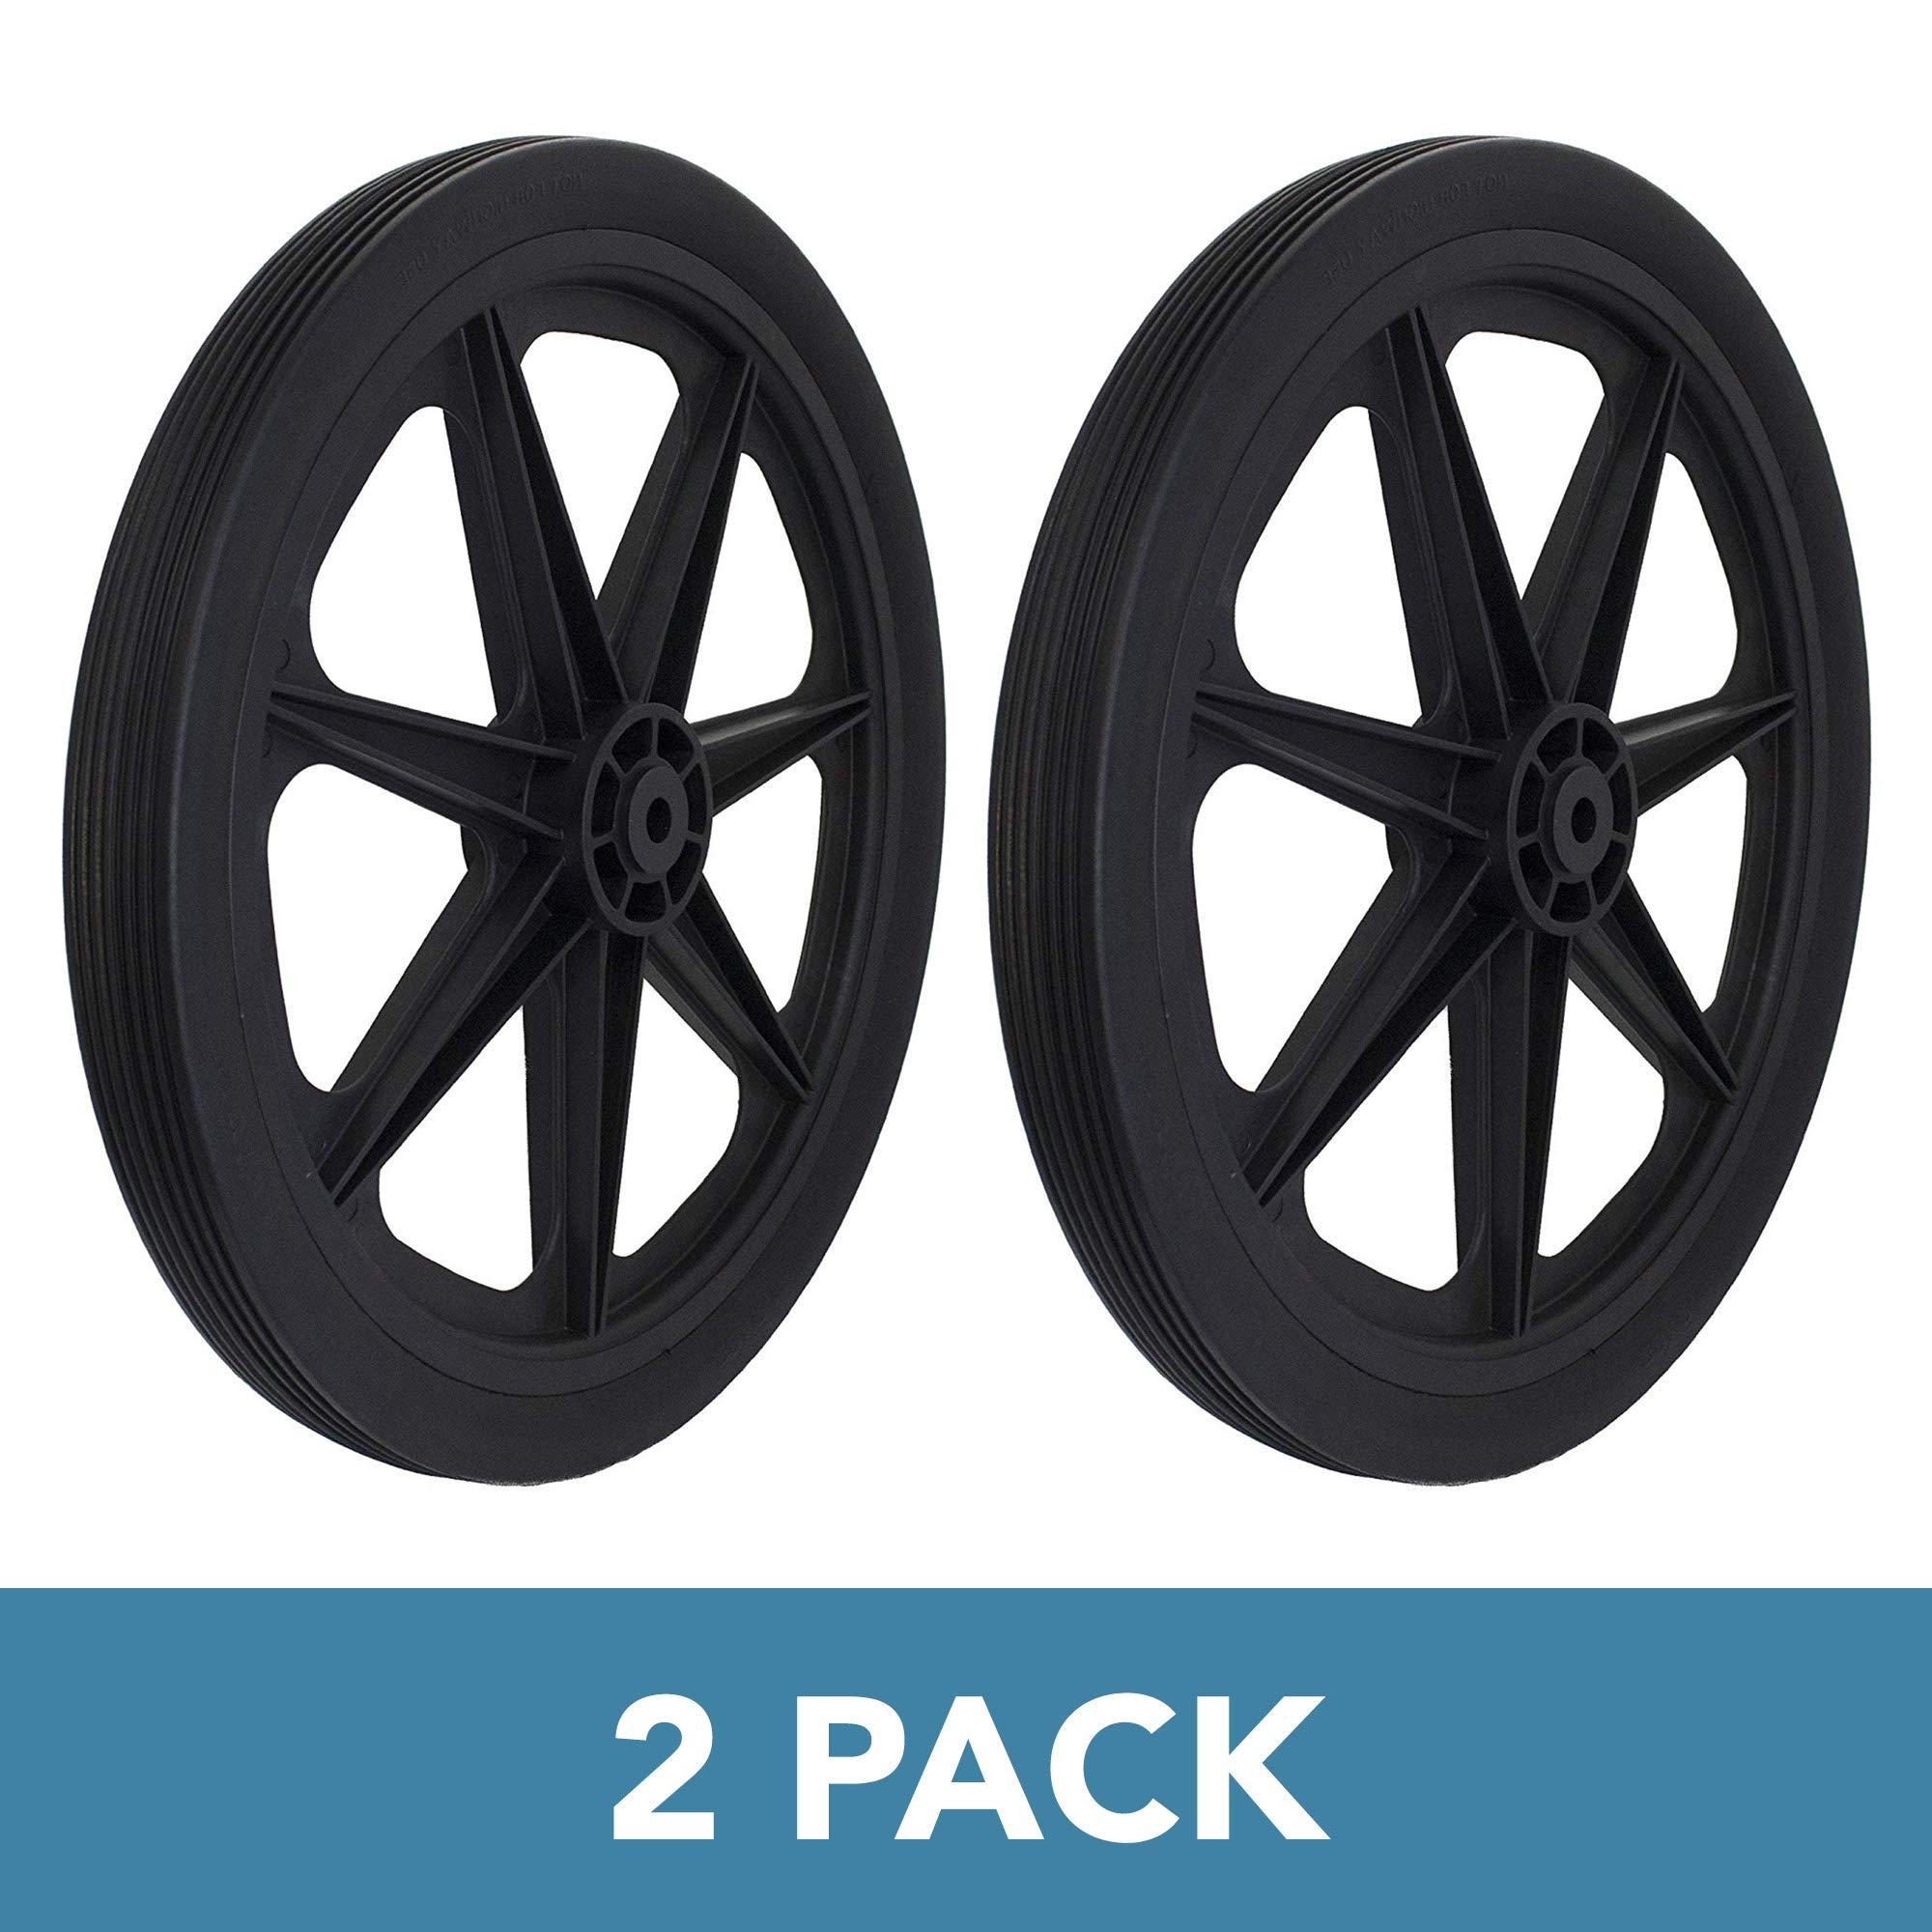 Marathon 92009-2pk Flat Free Marine Cart Replacement Tire, Black by Marathon Industries